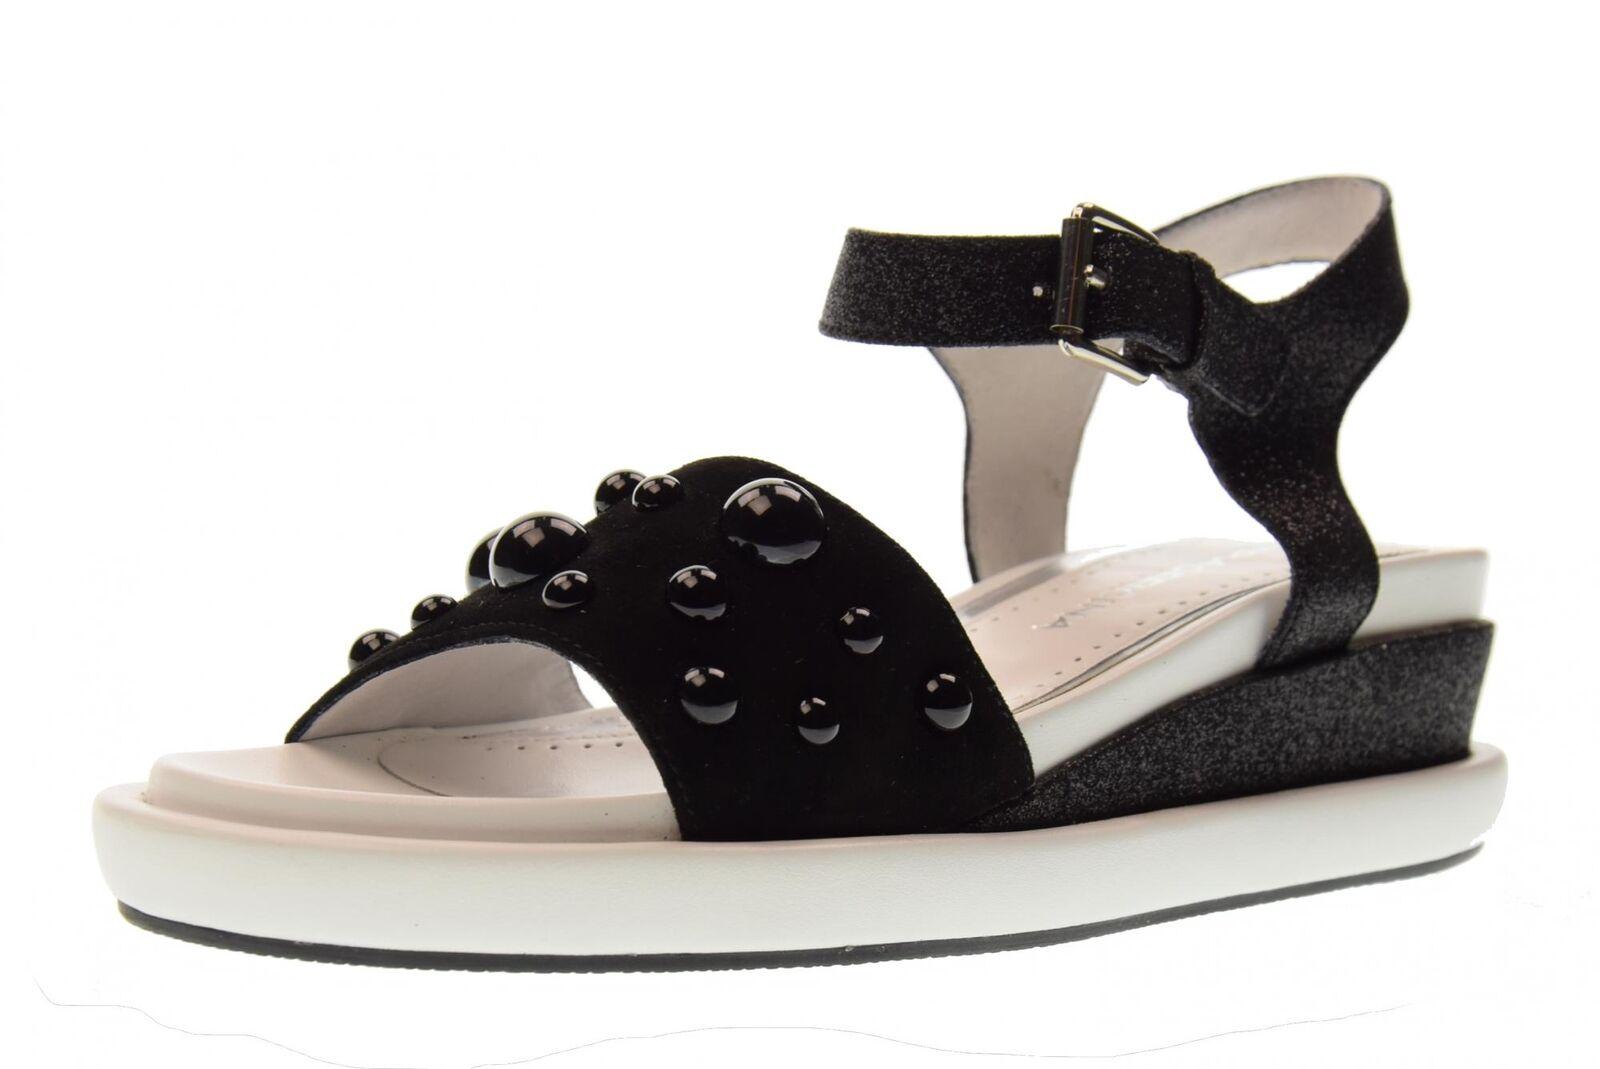 Altraofficina Q1302X Q1302X Q1302X schwarz Sandalen Schuhe P18g bfe456